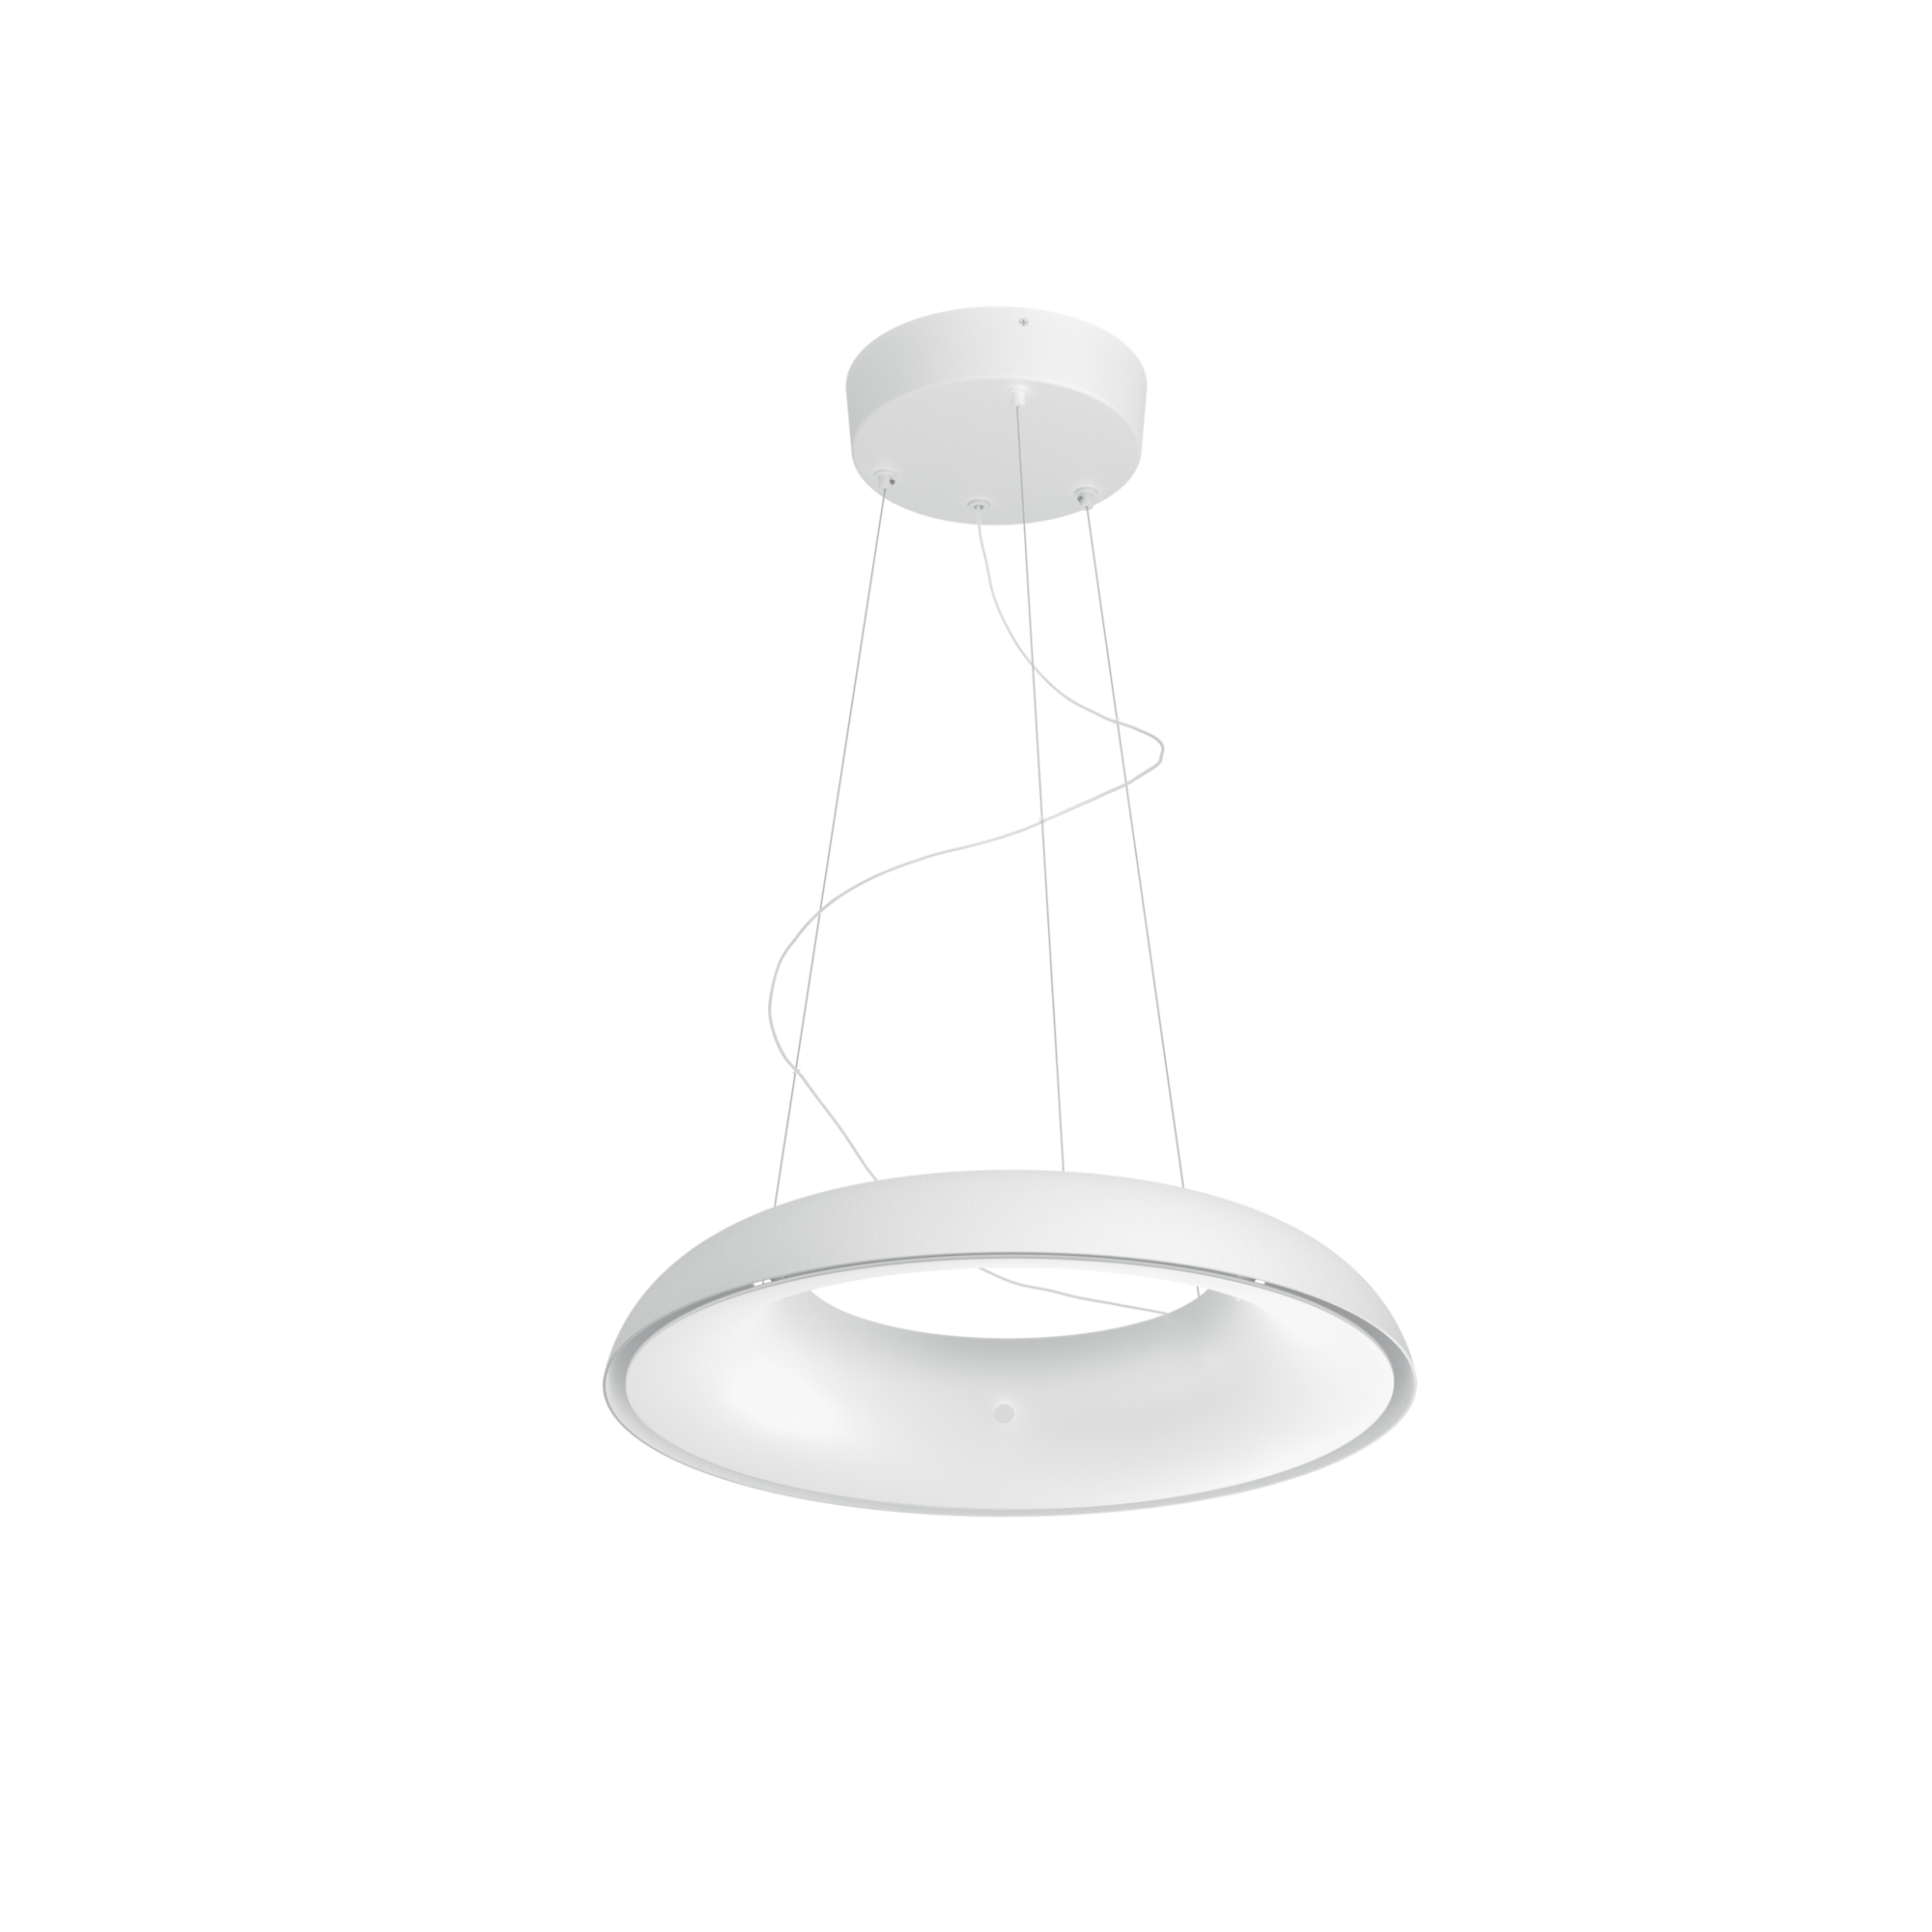 Systemfähige LED-Pendelleuchte